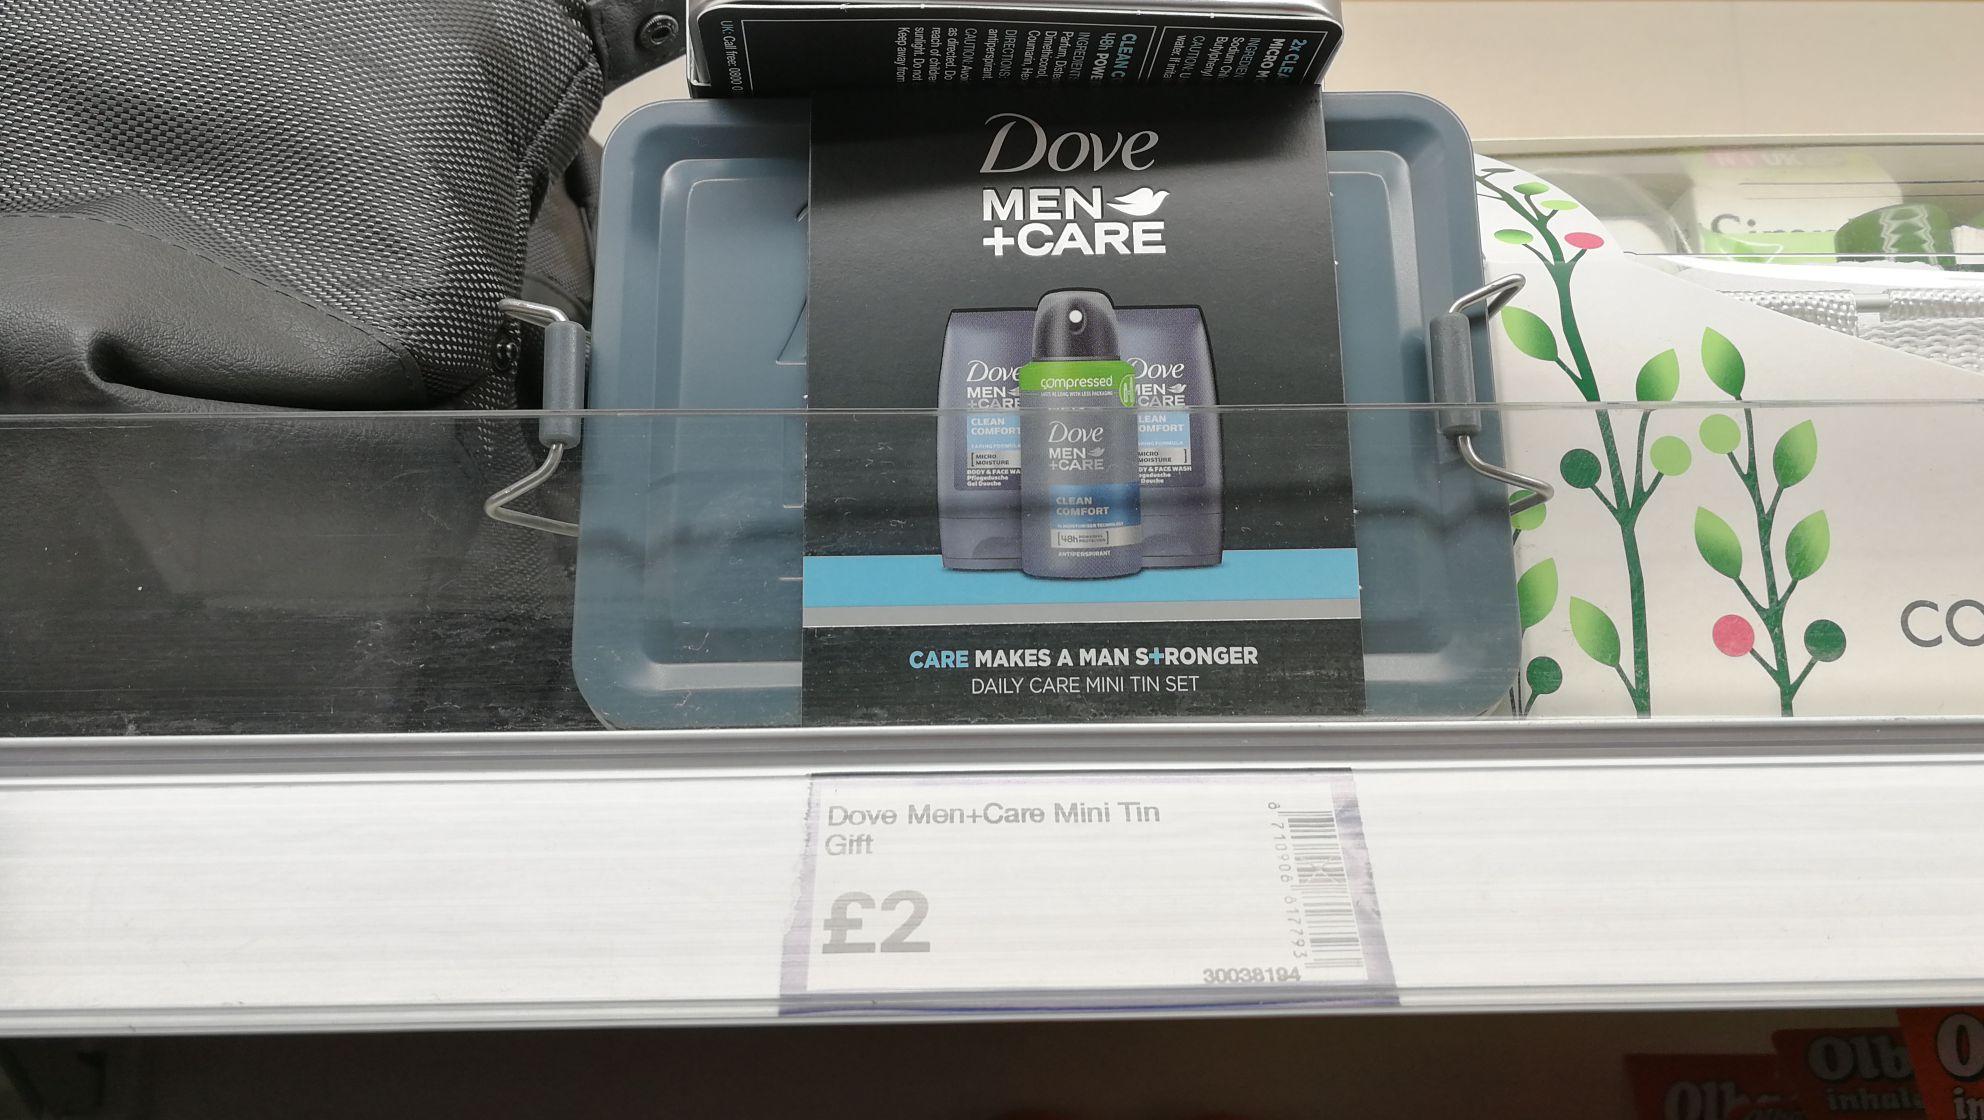 Dove men care mini tin gift set £2 @ Boyes